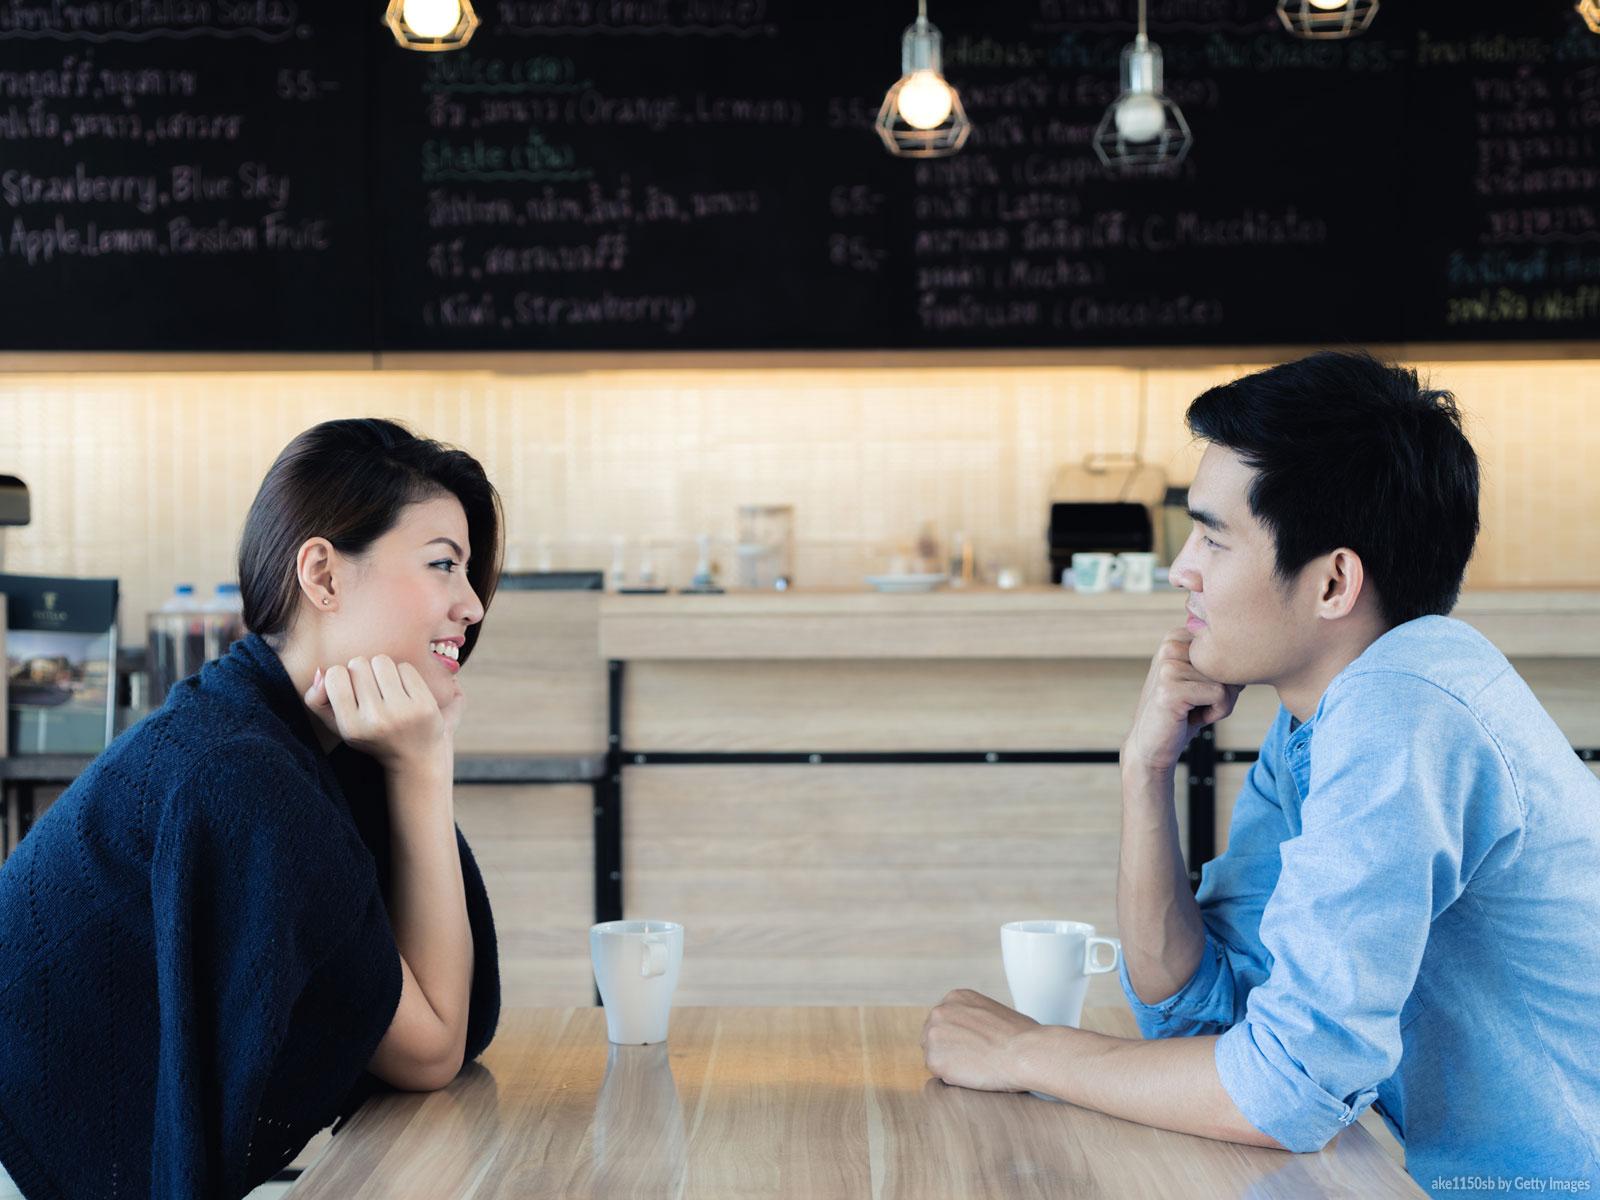 O-sexo-antes-do-casamento-poder-unir-mais-o-casal